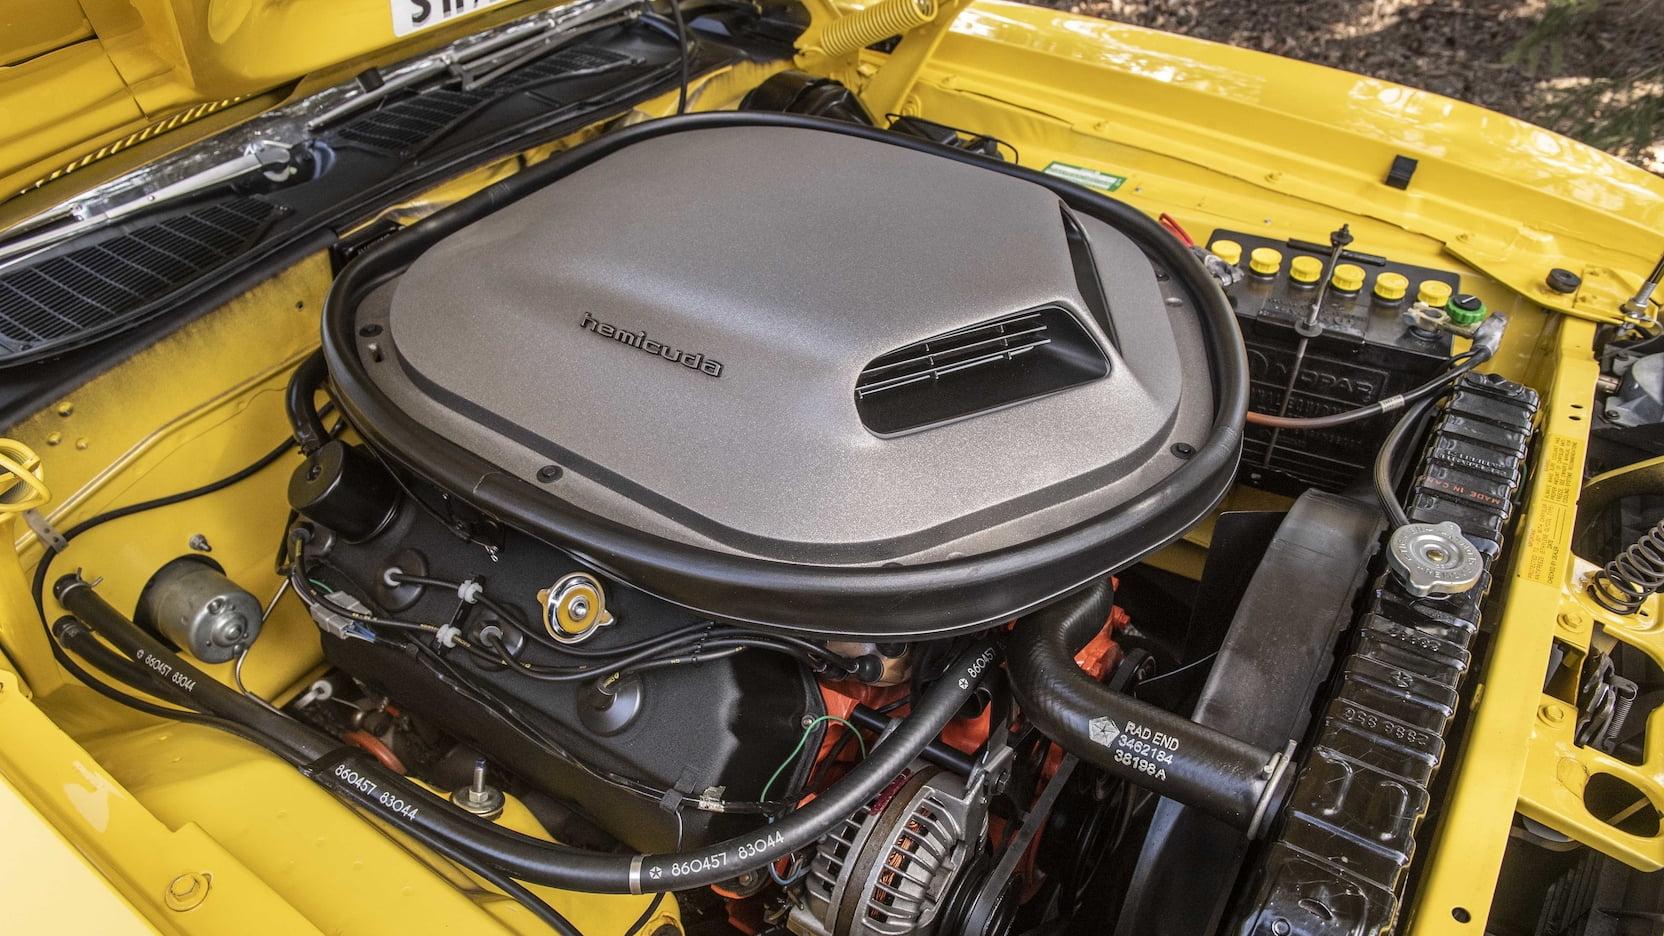 1970 Plymouth Hemi Cuda Convertible engine passenger side